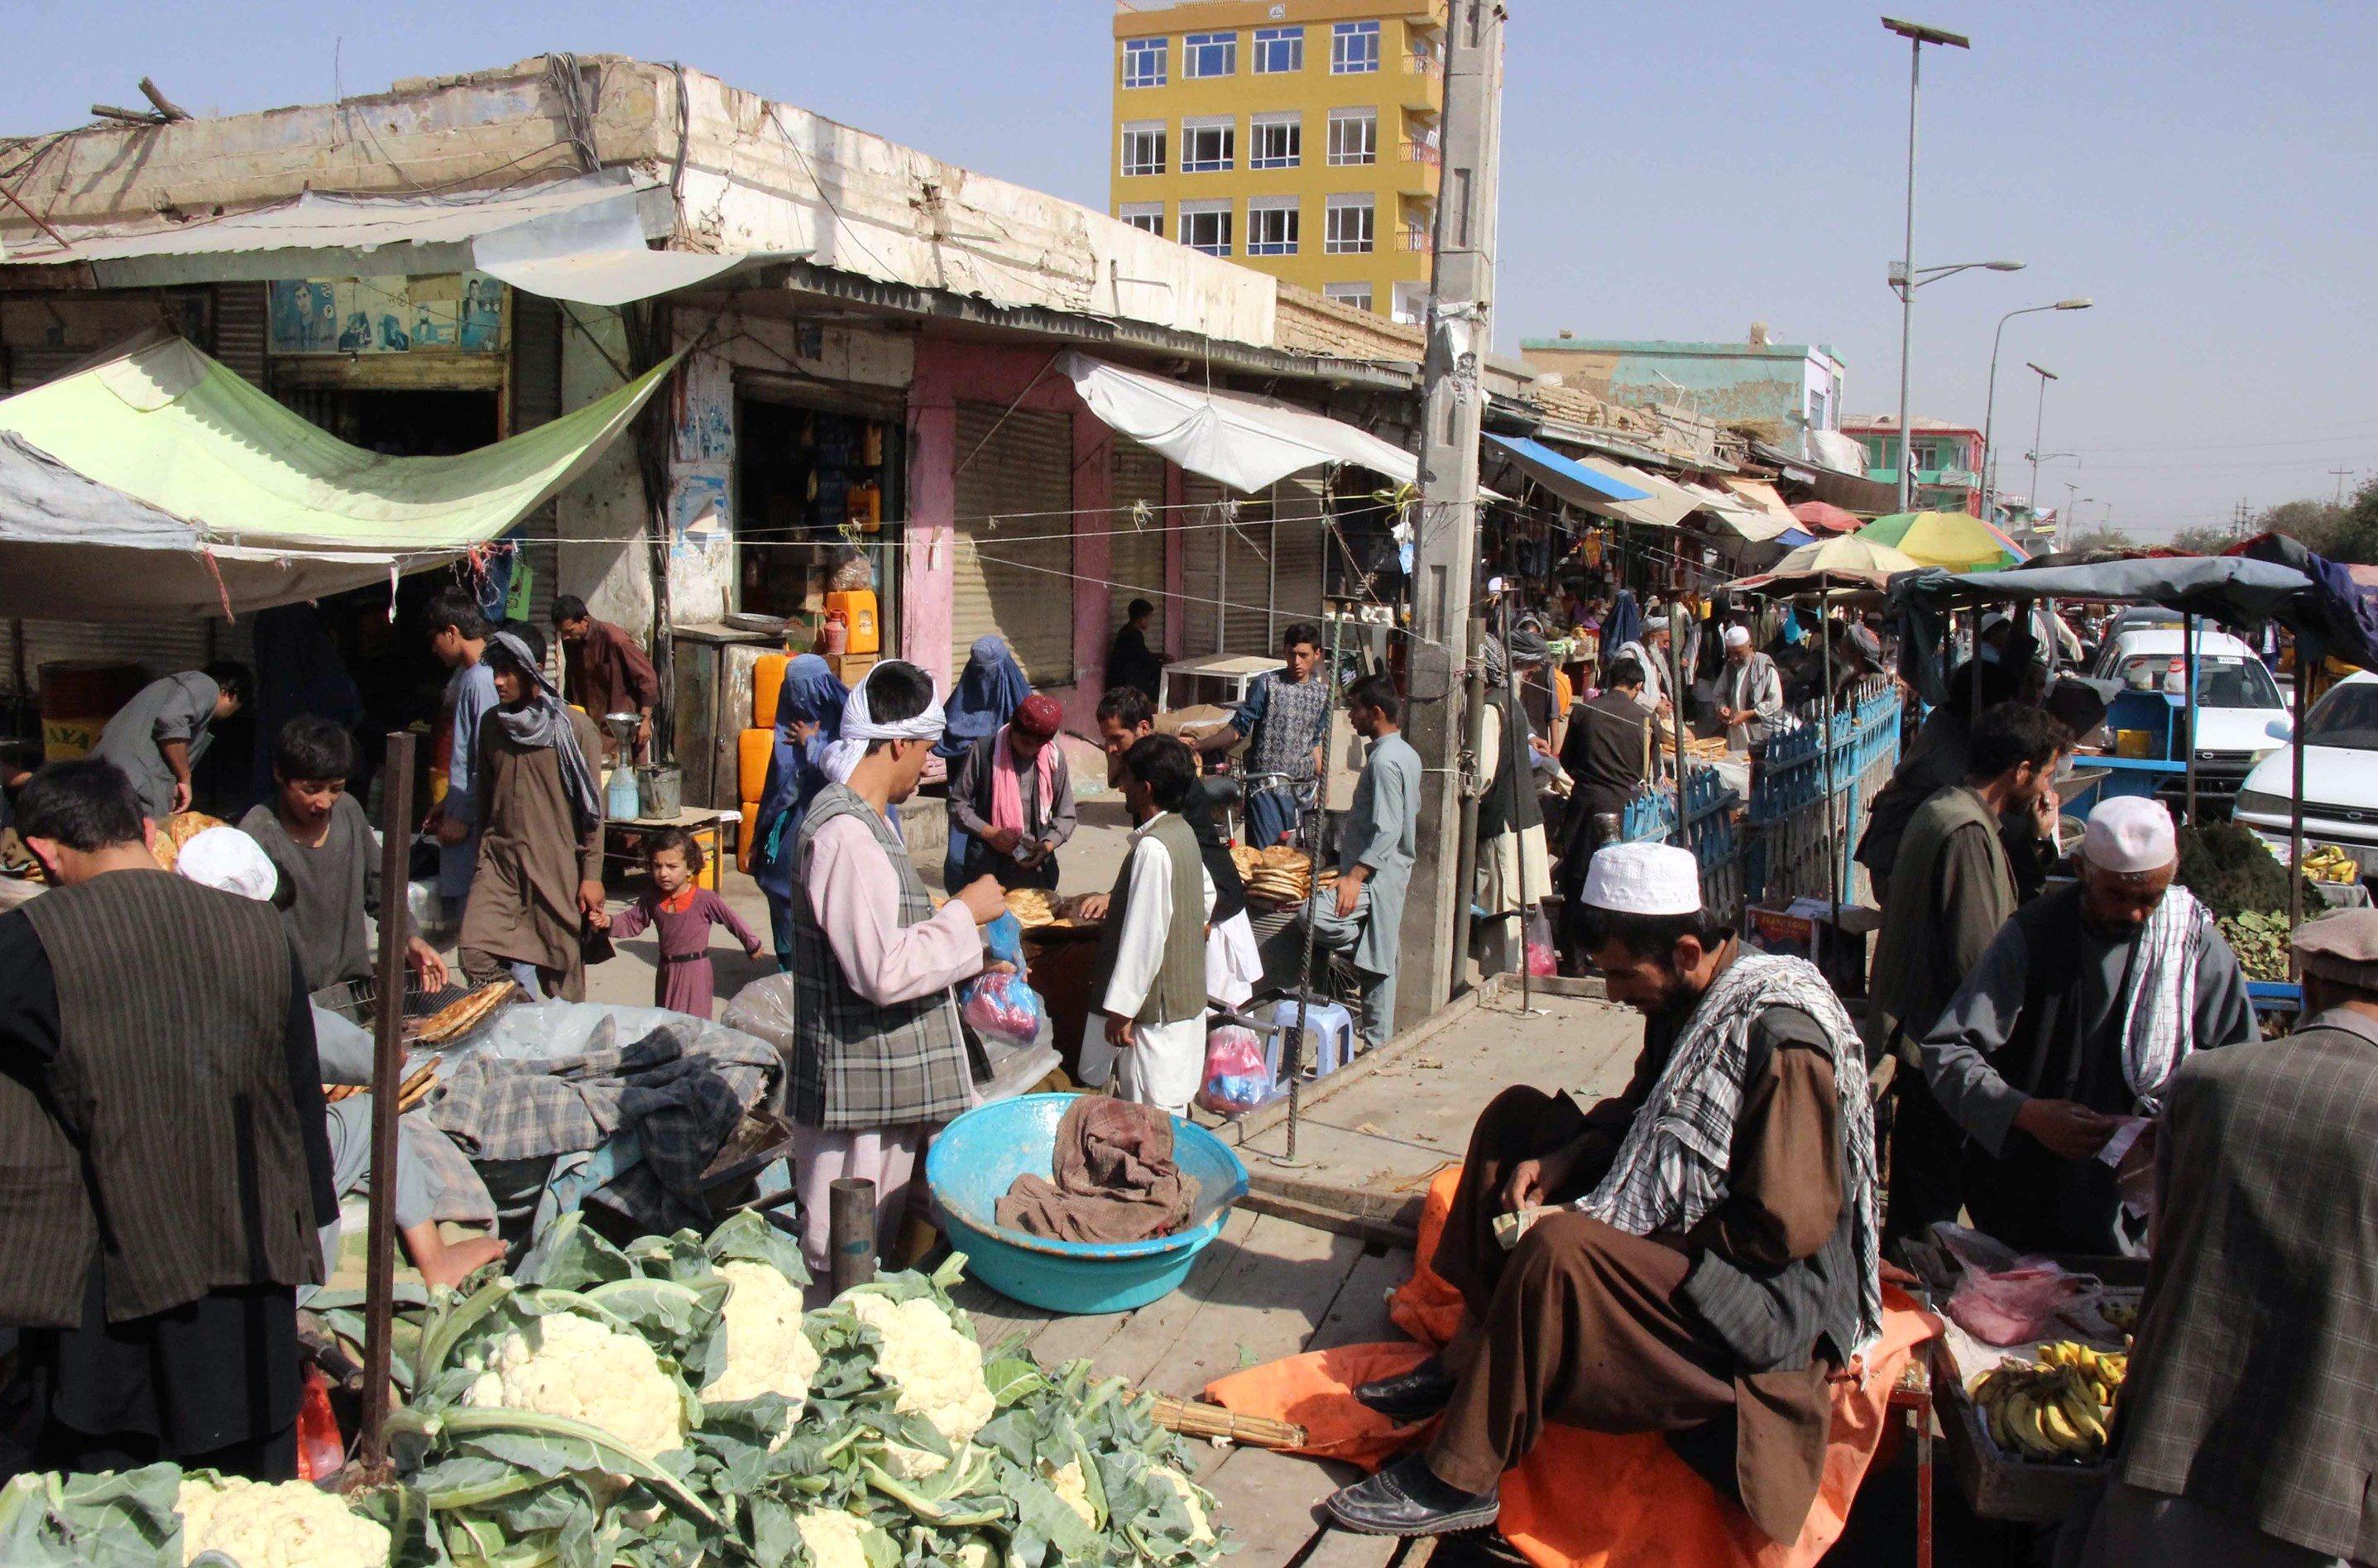 Rampant Taliban capture key city as Afghan resistance crumbles in wake of U.S. withdrawal